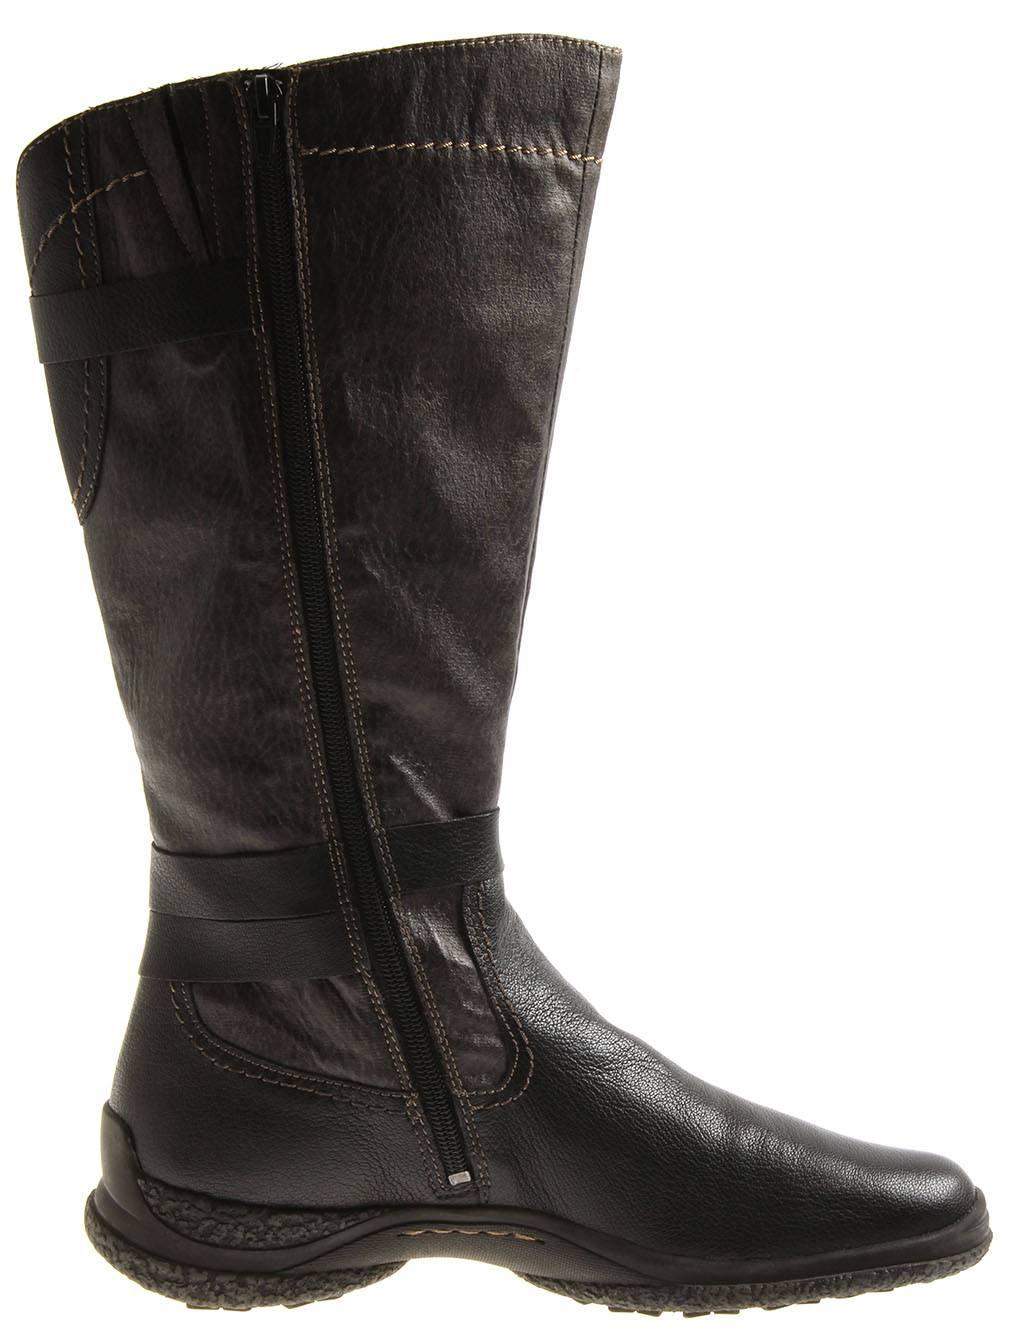 Tamaris 1 25605 Damen Winterstiefel Stiefel Schuhe